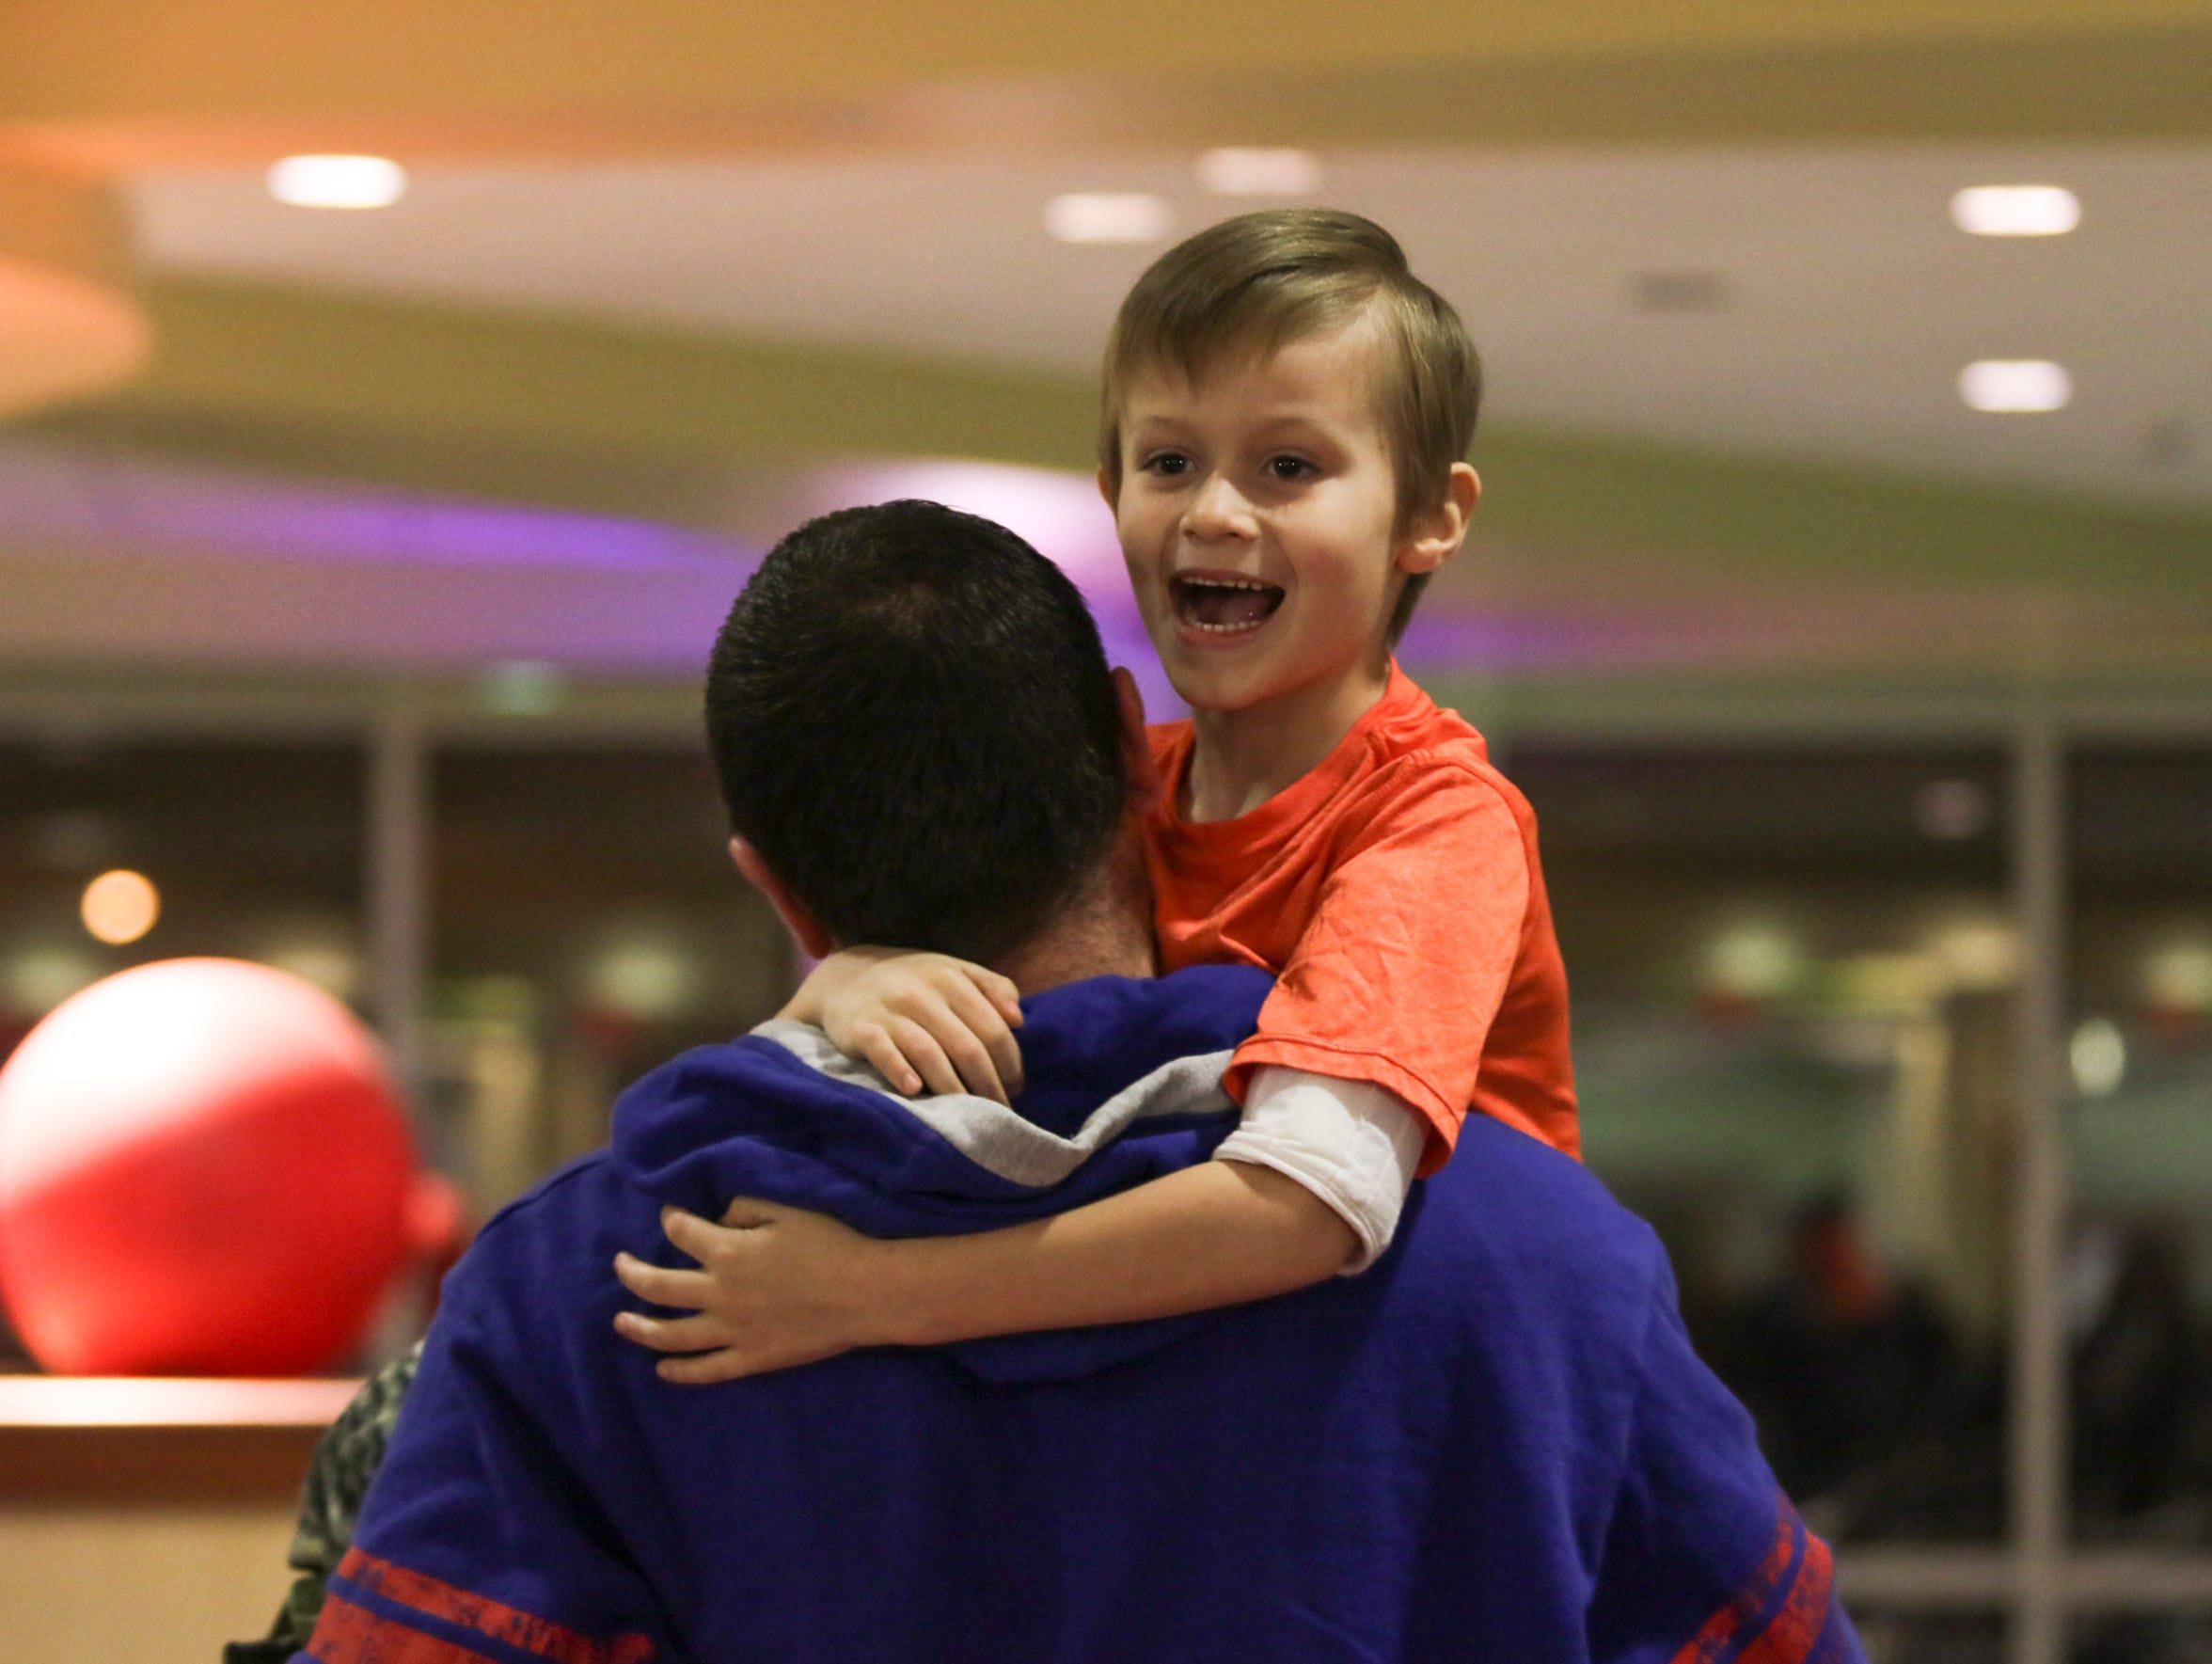 Noah Coffman, 6, is carried by his stepdad Adam Albertson